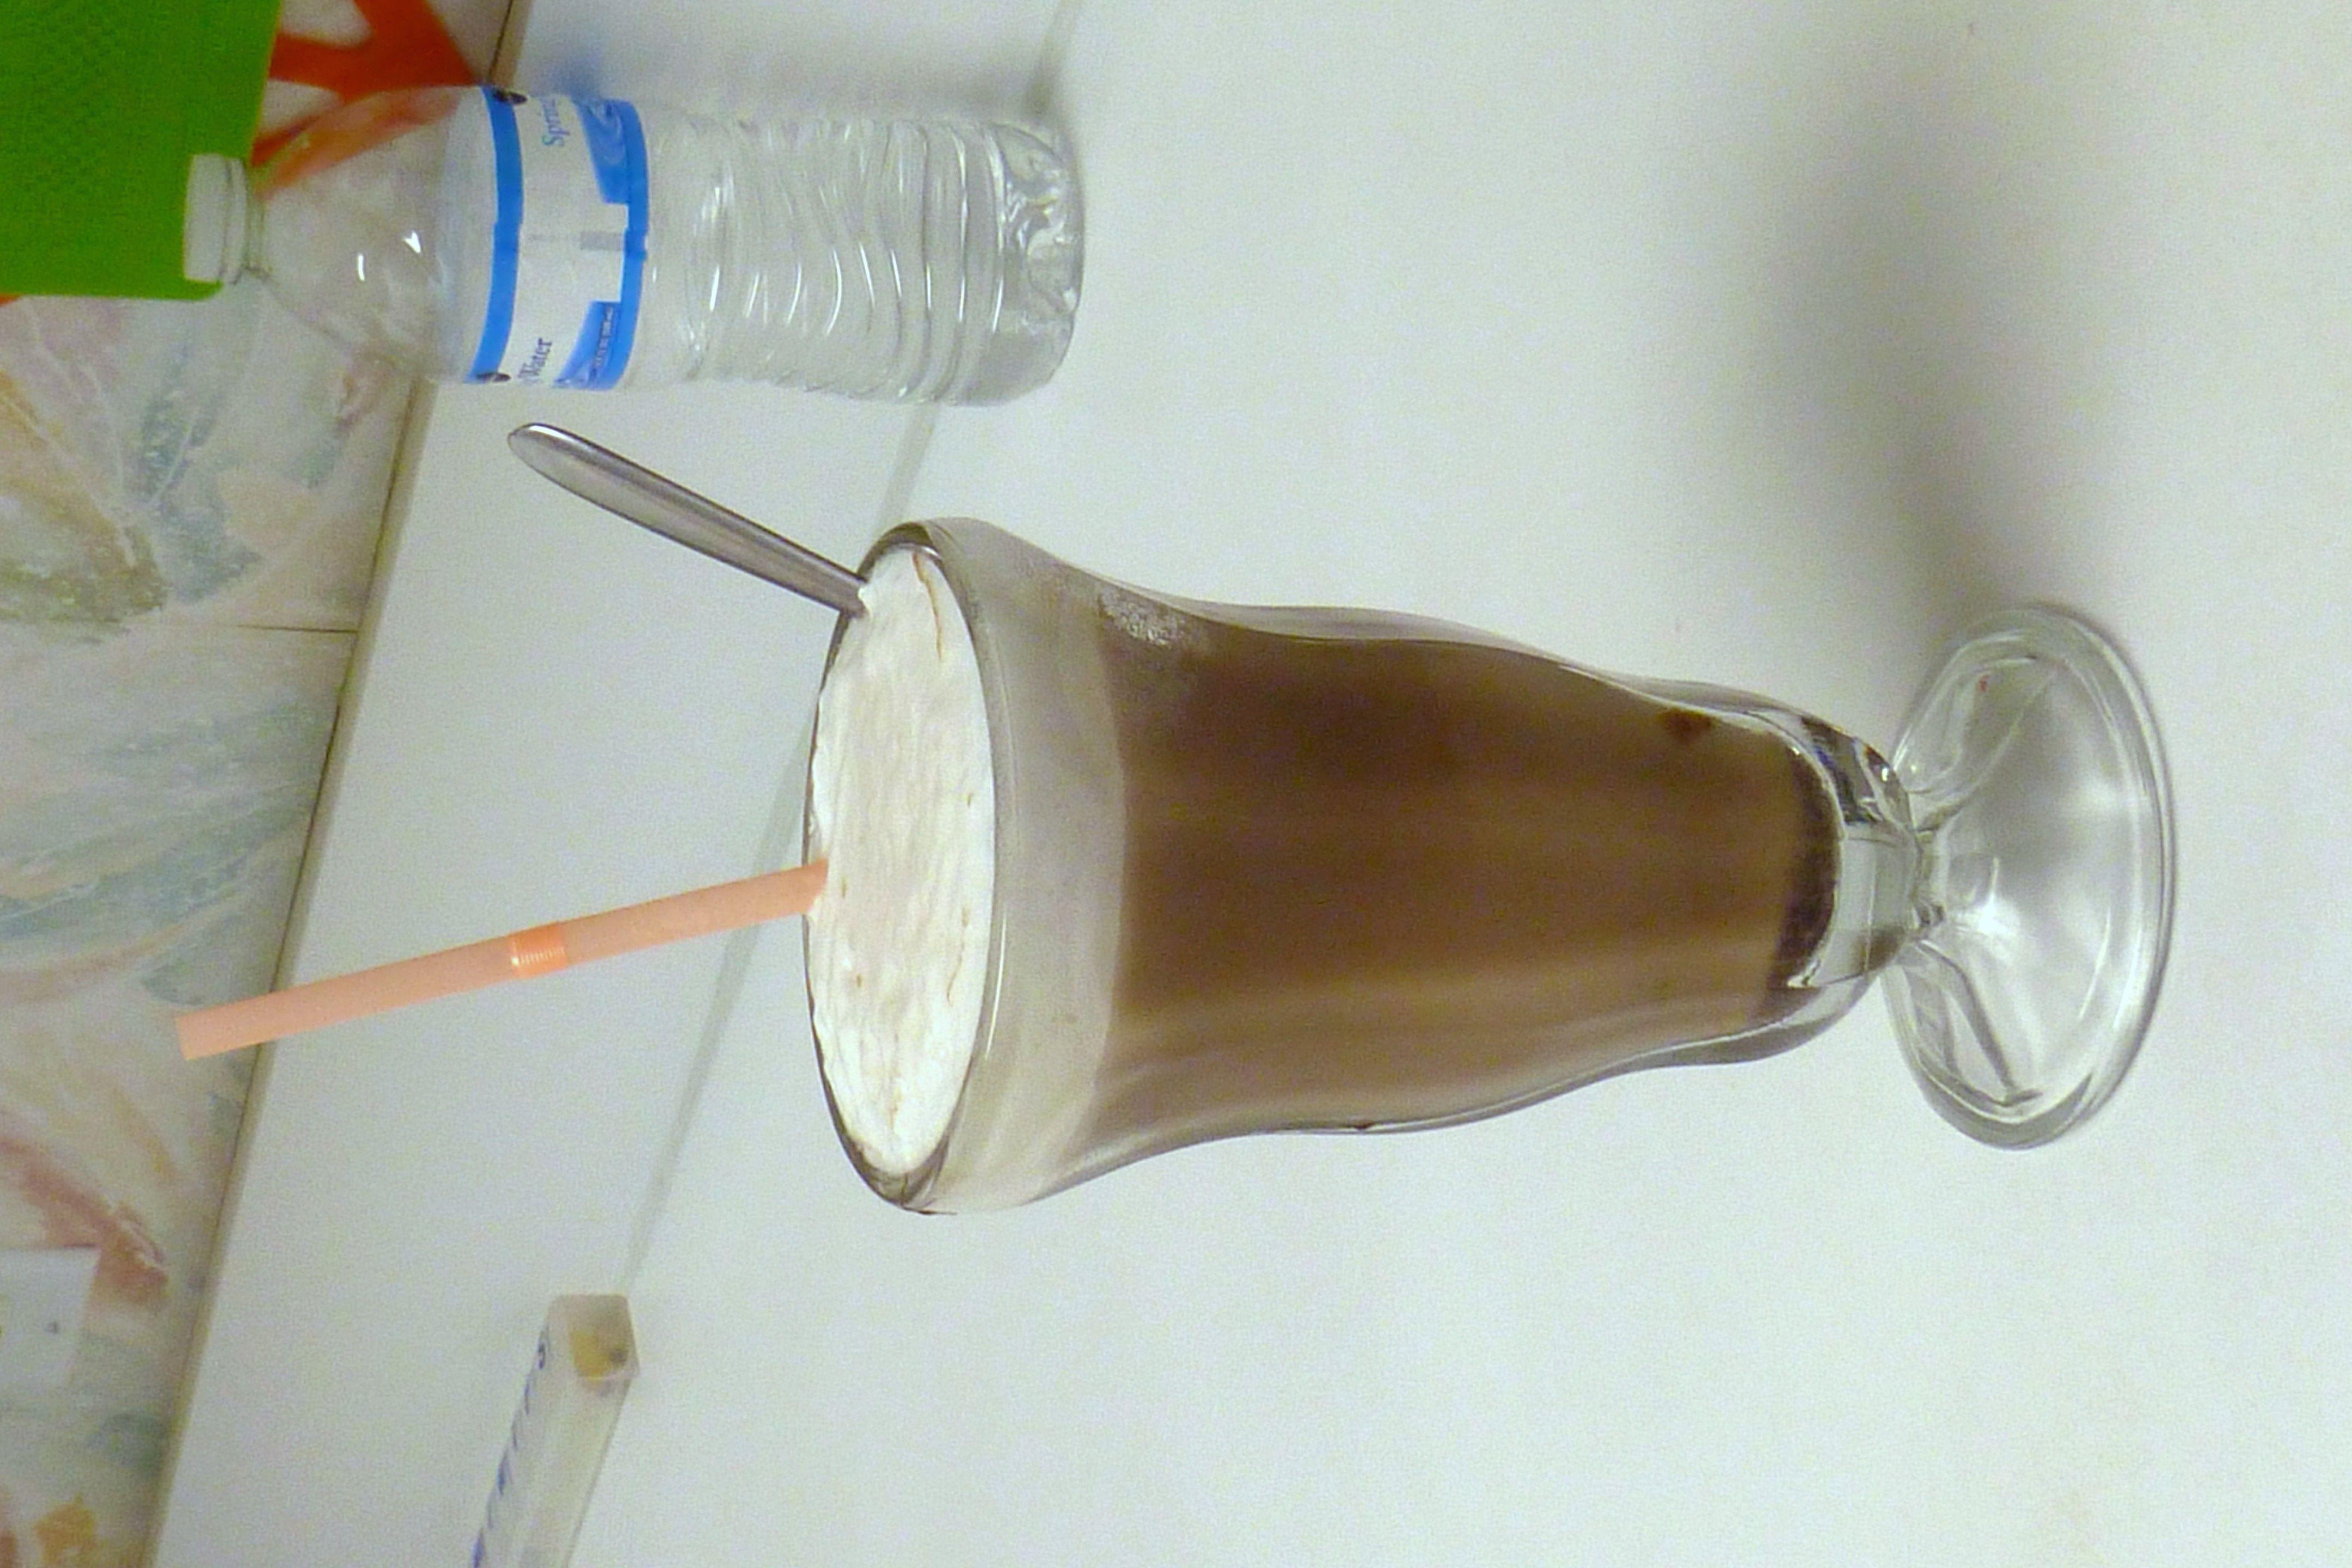 File:Chocolate Egg Cream.jpg - Wikipedia